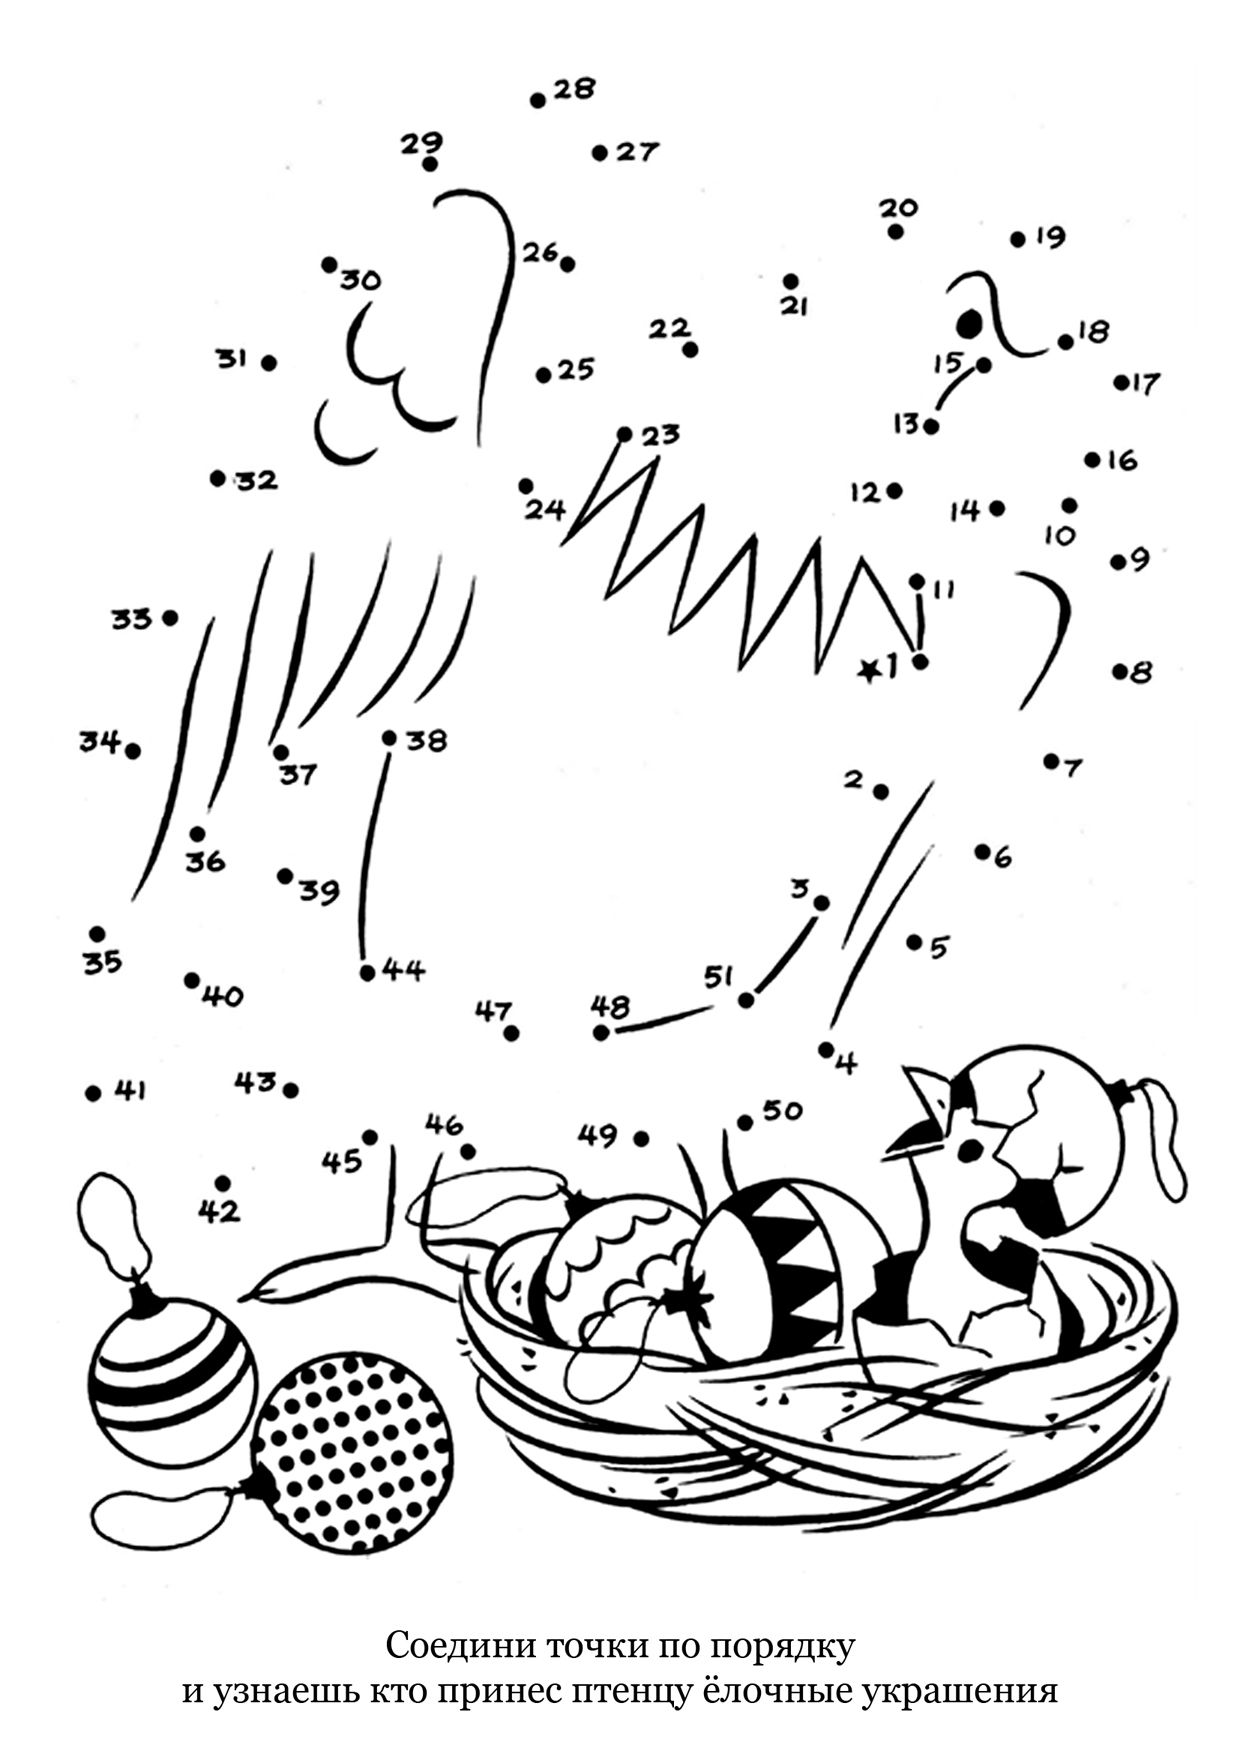 12 51 Prikker Rnemor